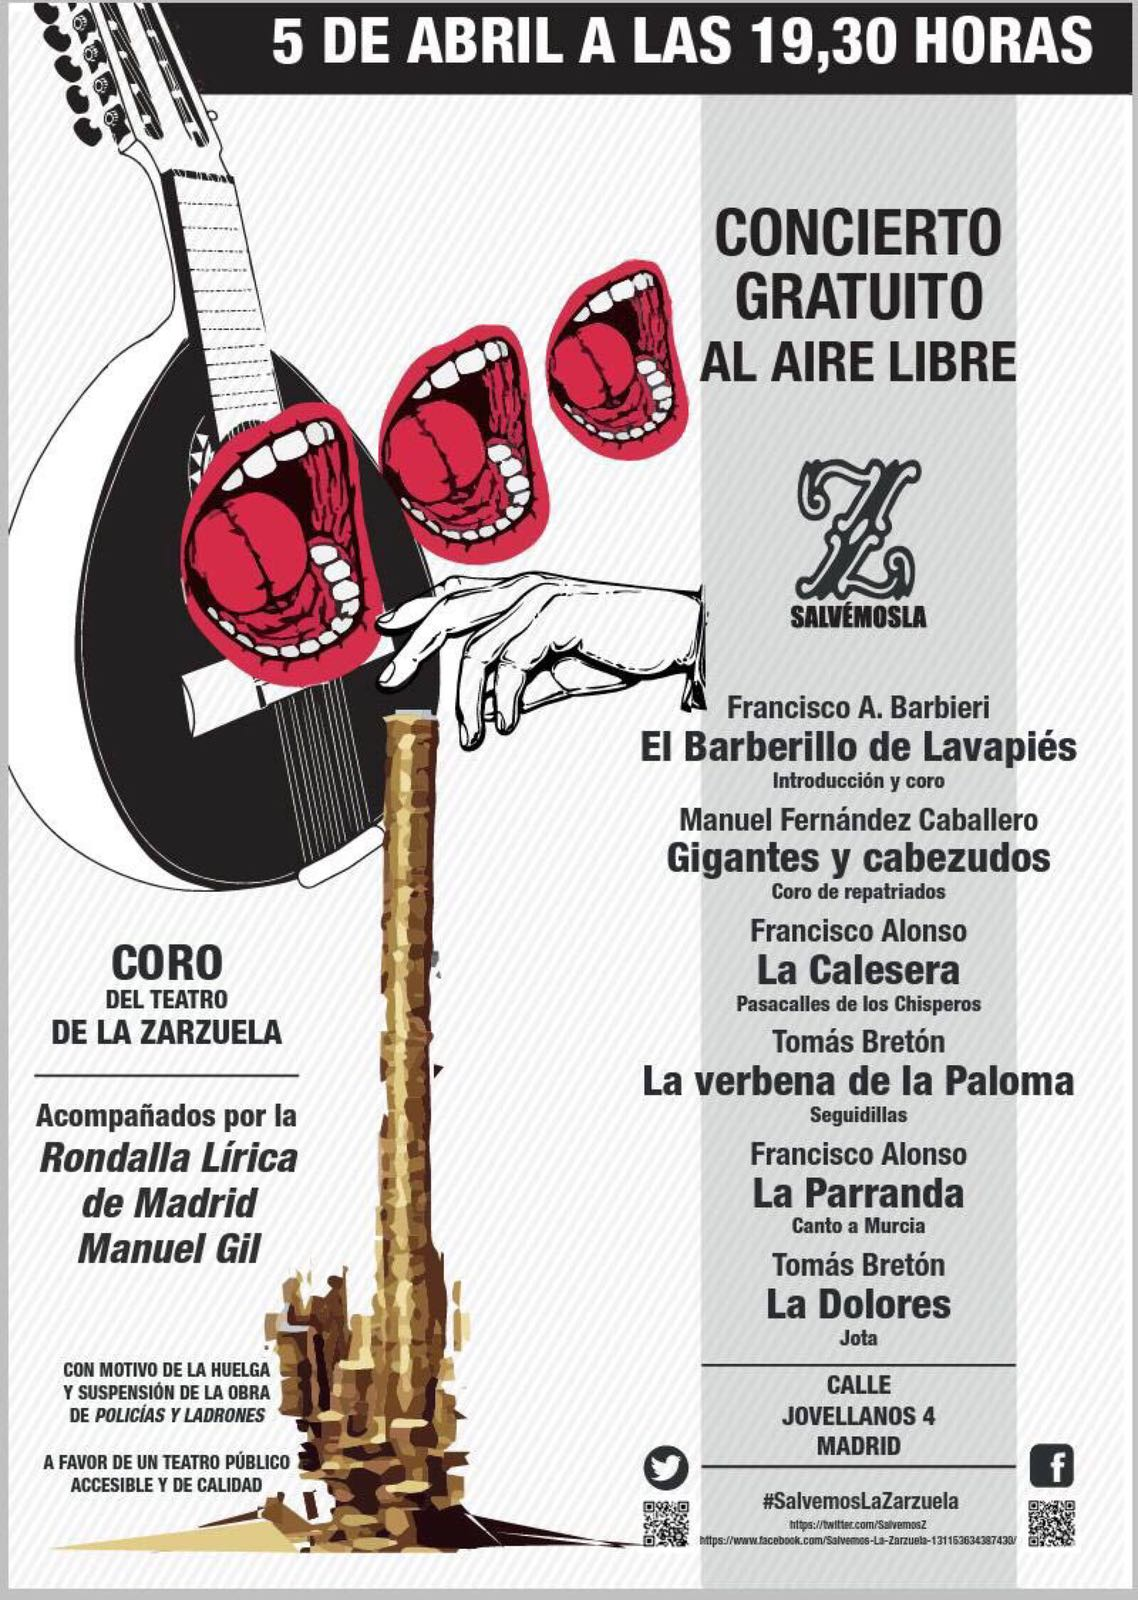 5 de abril #SalvemosLaZarzuela